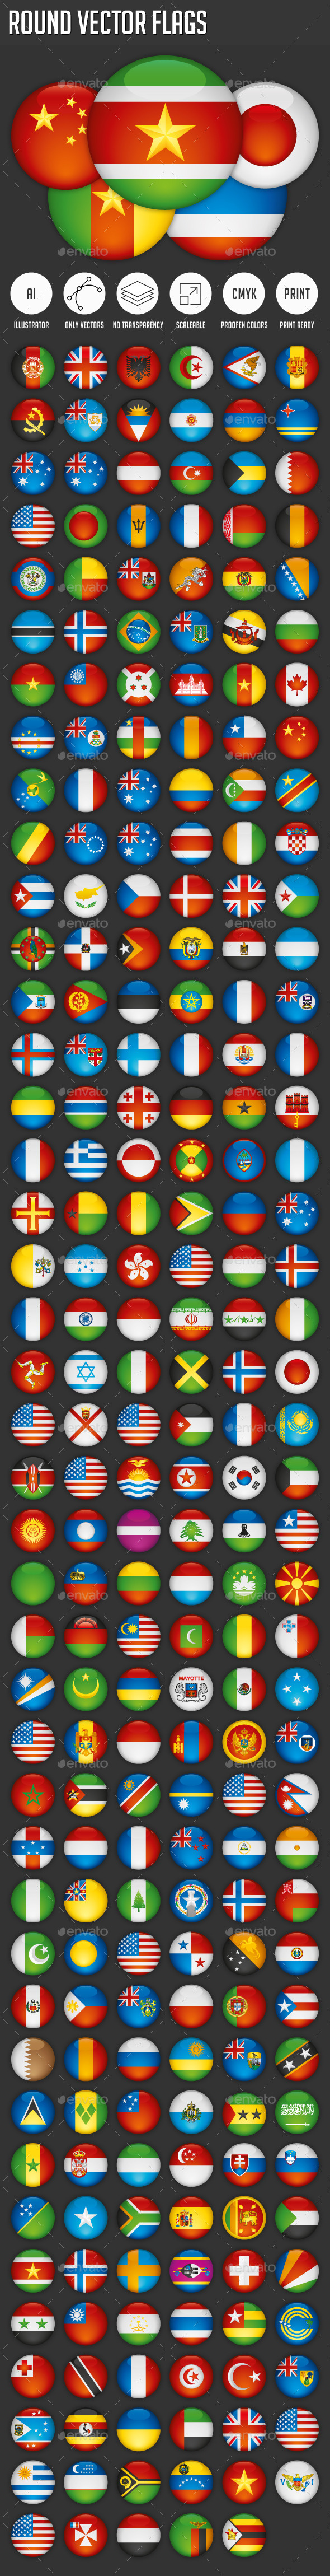 Round Vector Flags - Web Elements Vectors